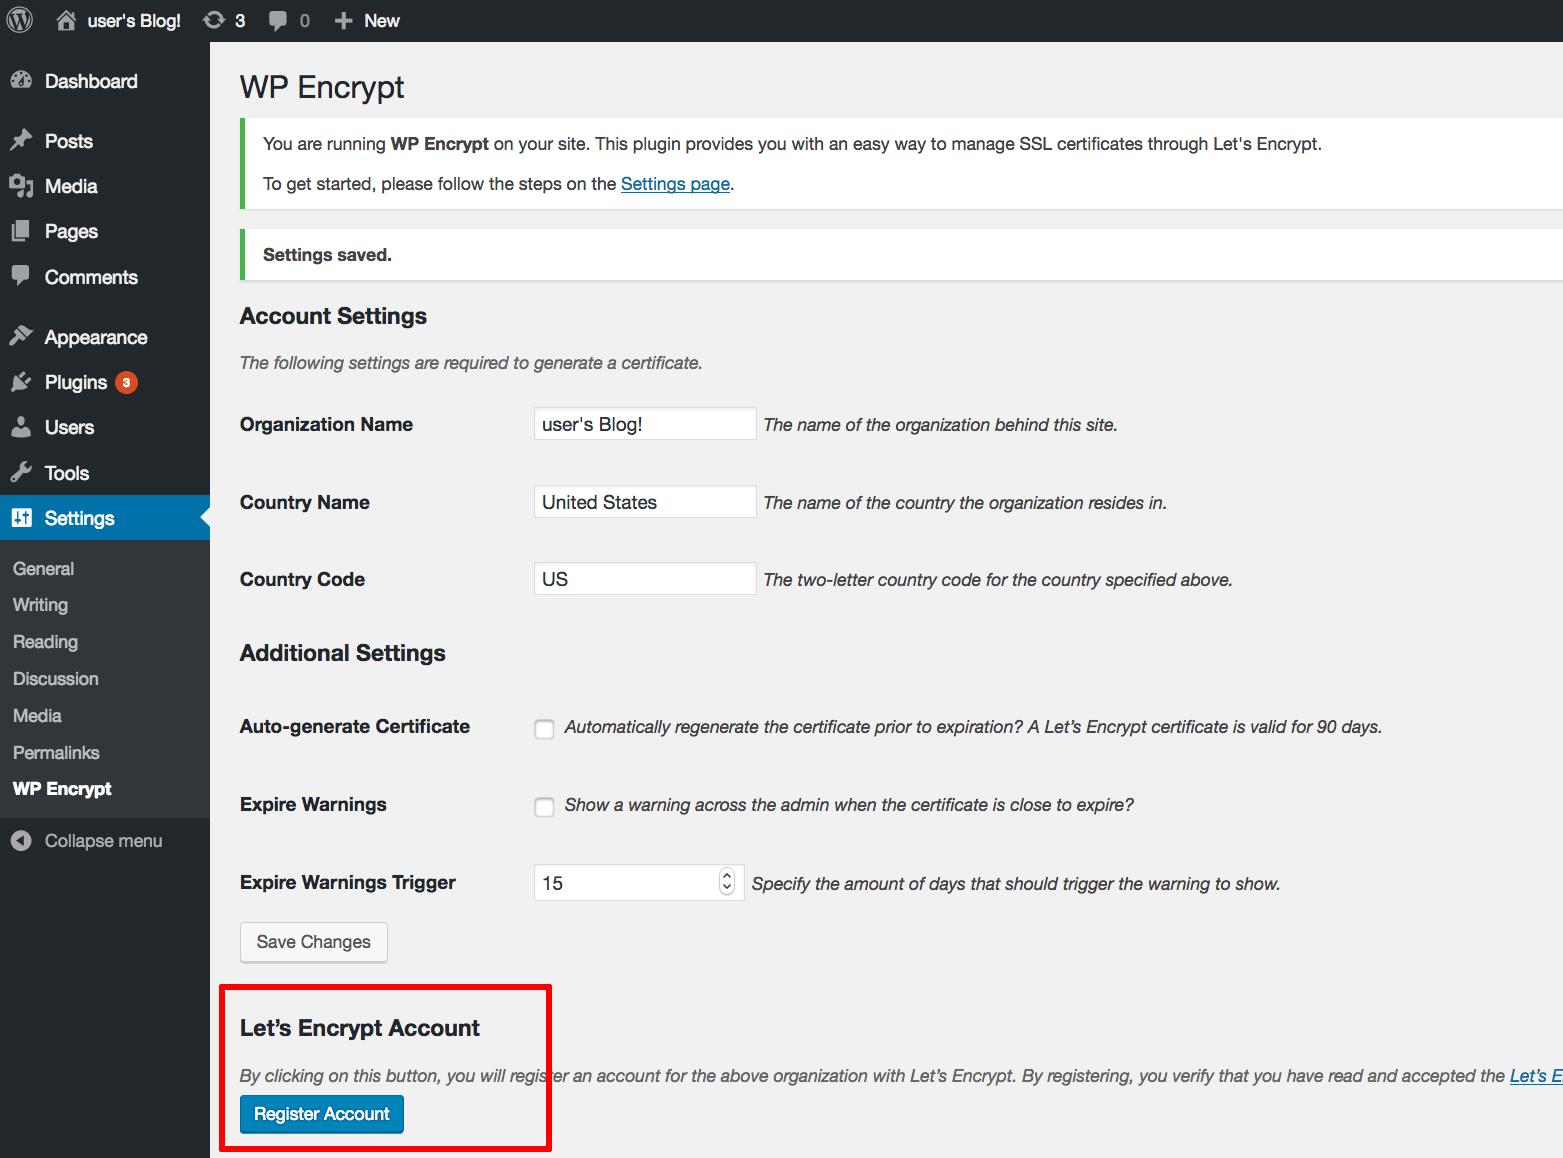 WP Encrypt account registration